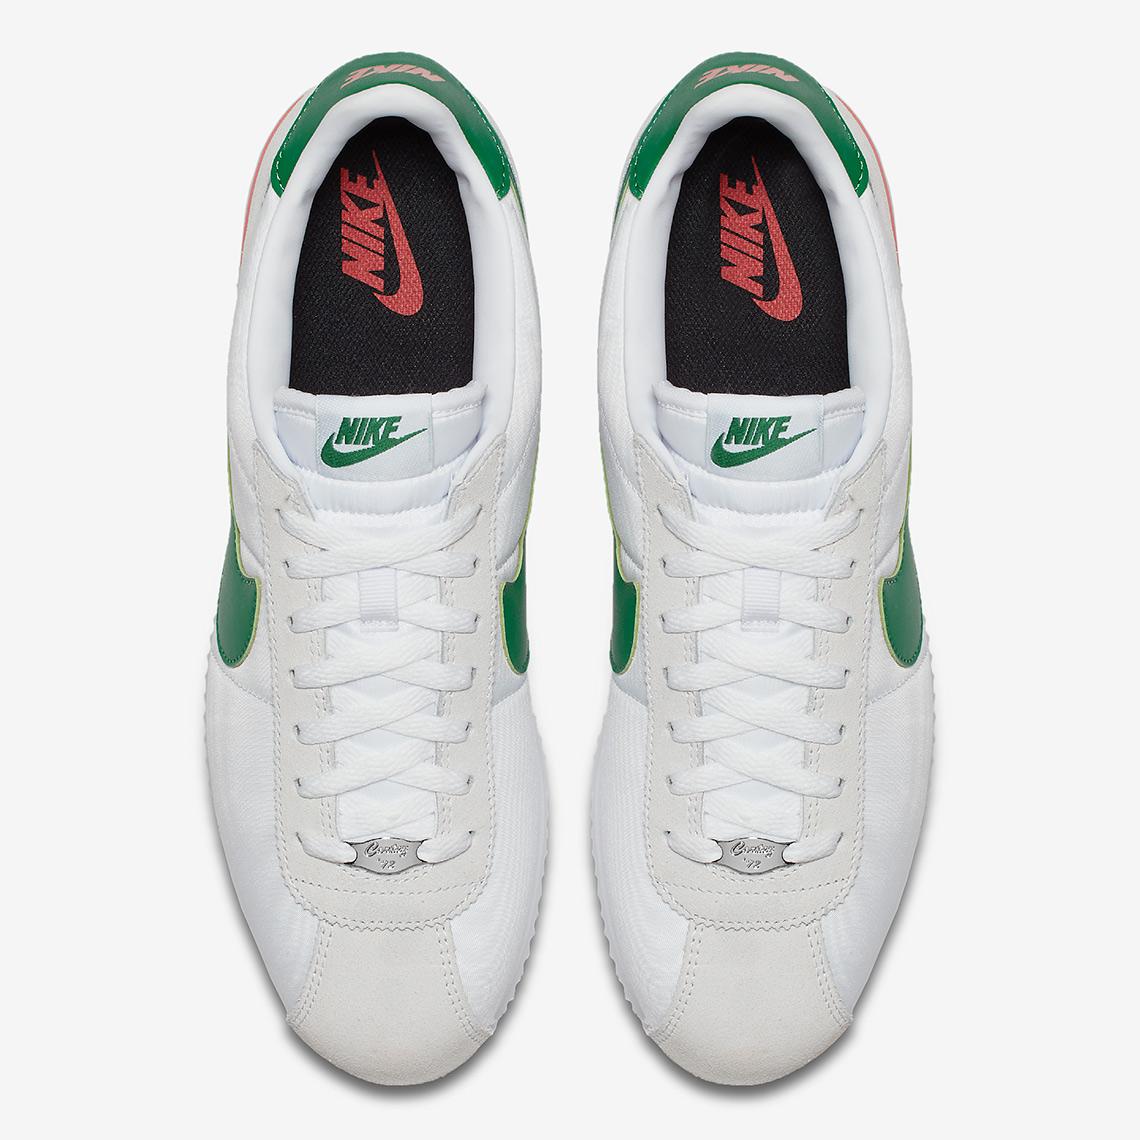 best service 954ab 12857 Nike Cortez 819720-103 Cinco de Mayo Buy Now   SneakerNews.com